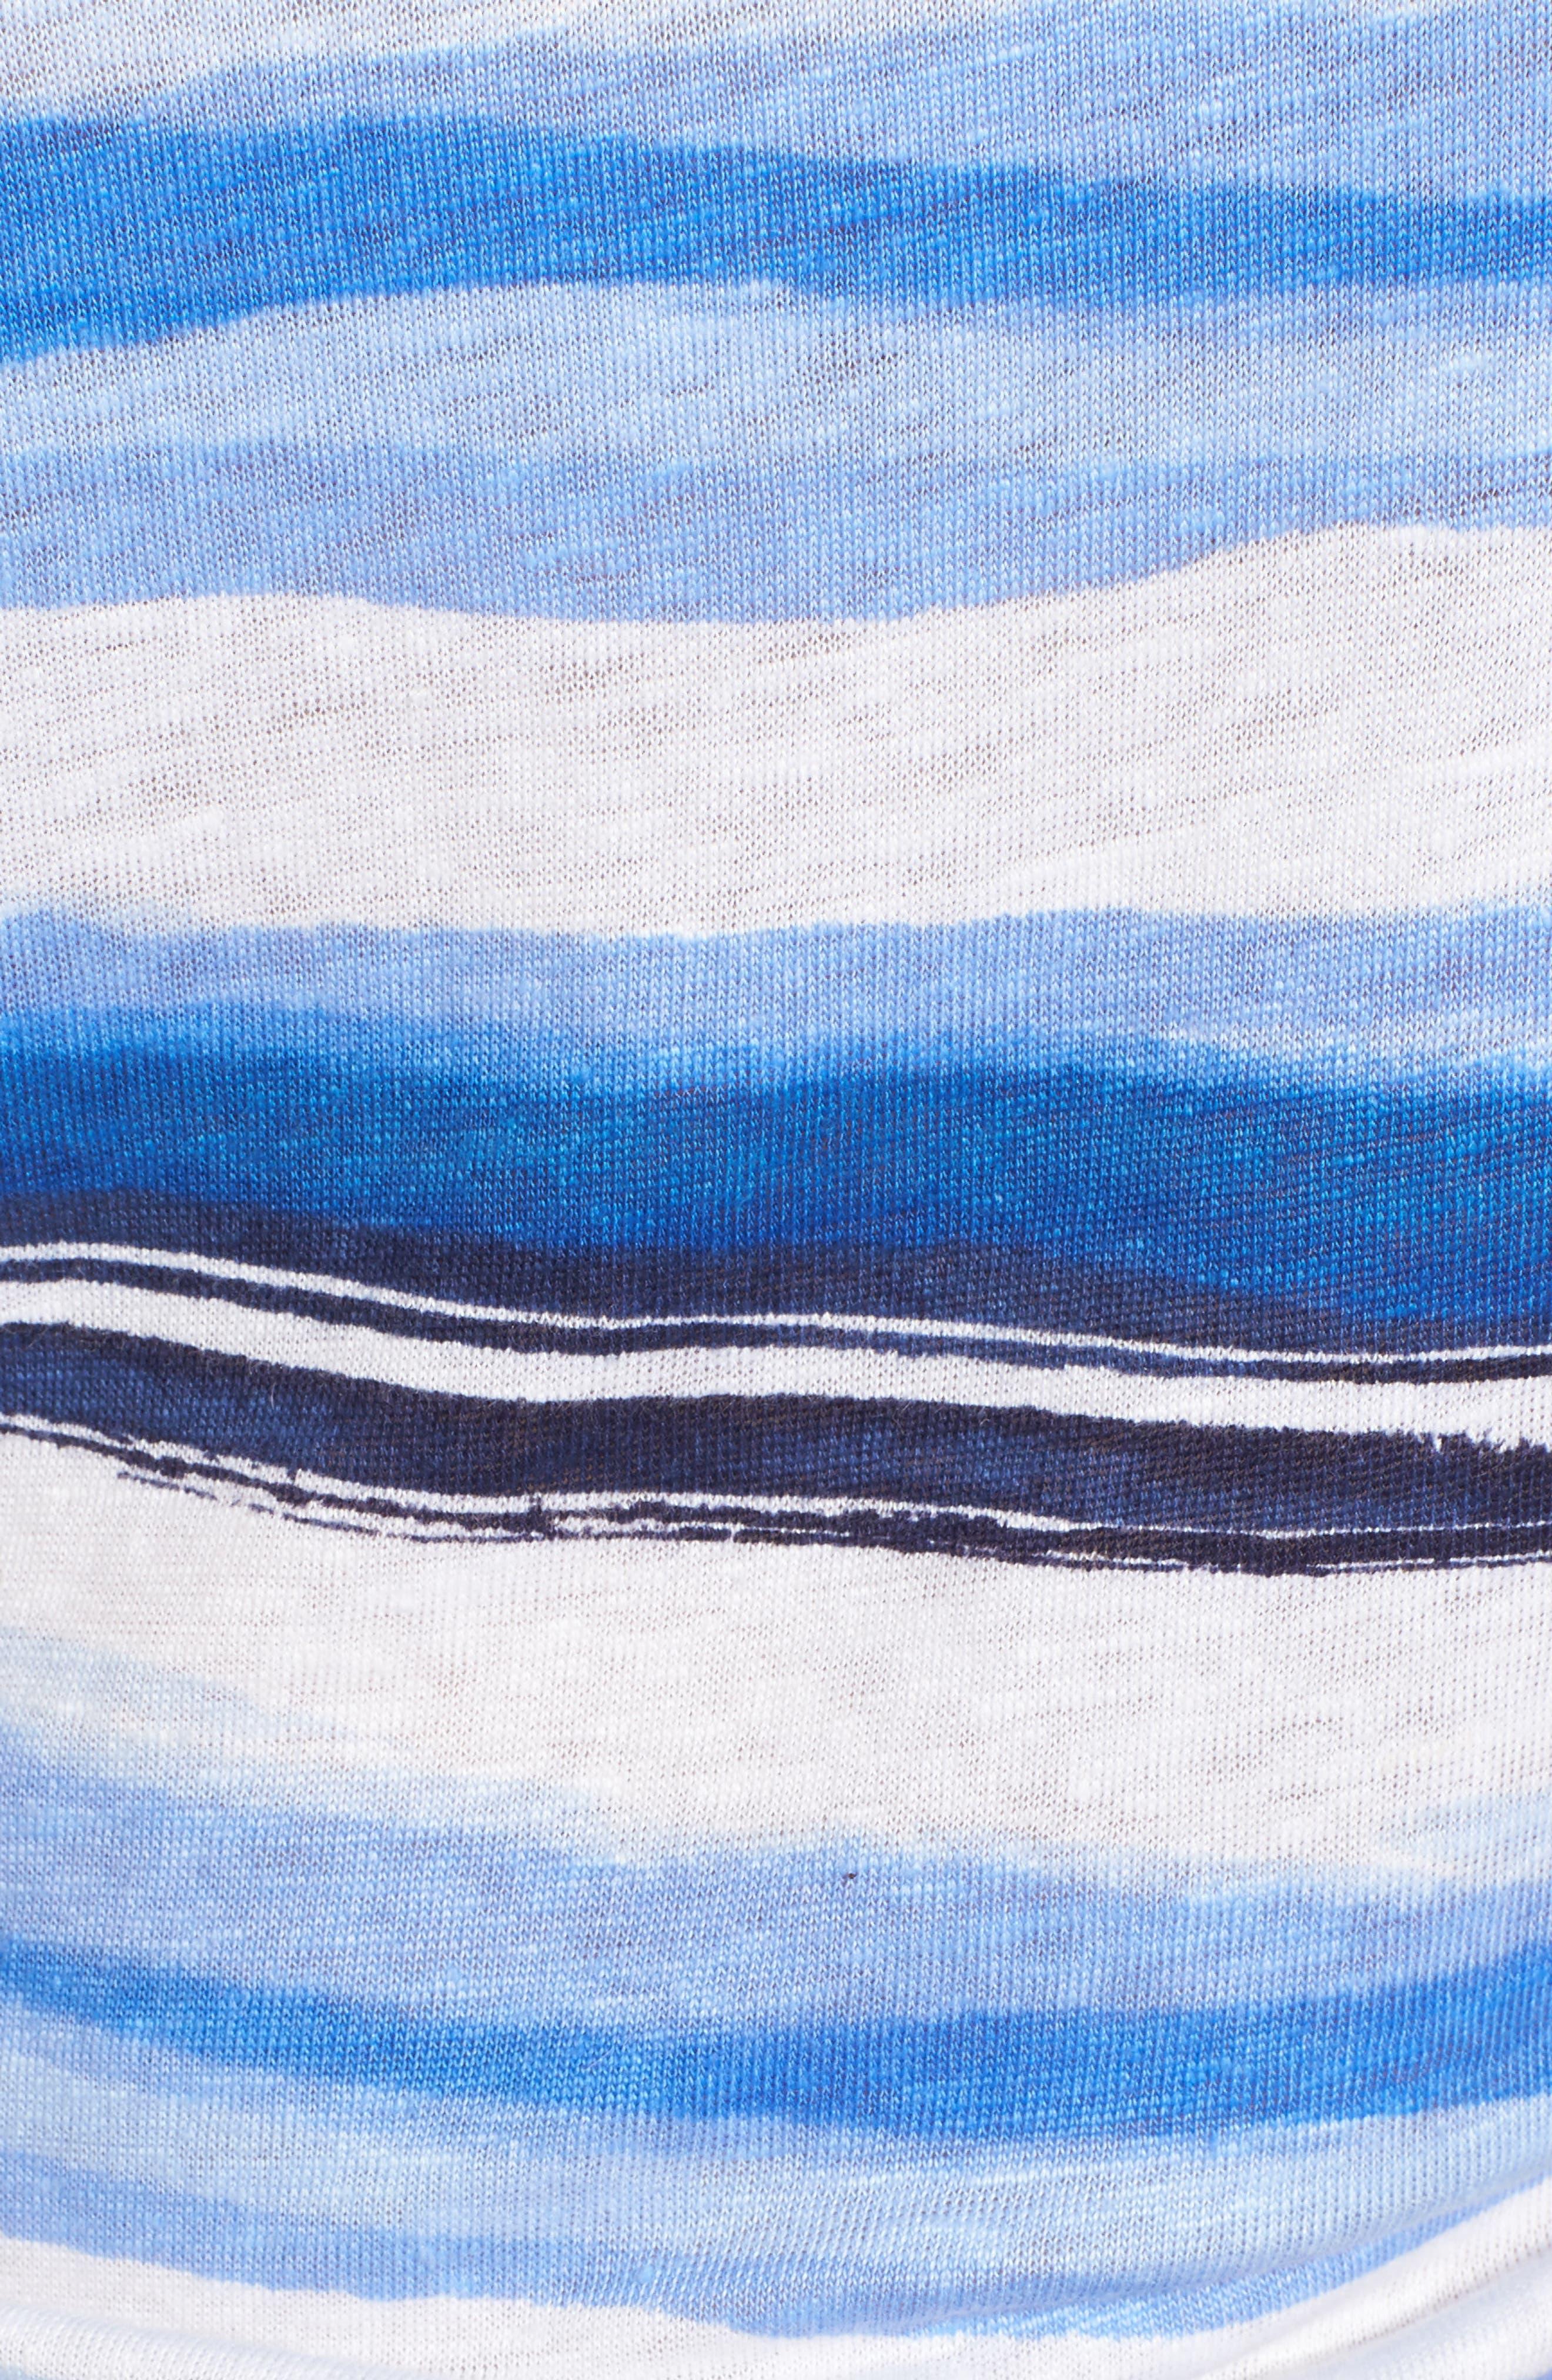 TOMMY BAHAMA,                             Hazy Horizons Cold Shoulder Linen Top,                             Alternate thumbnail 5, color,                             400